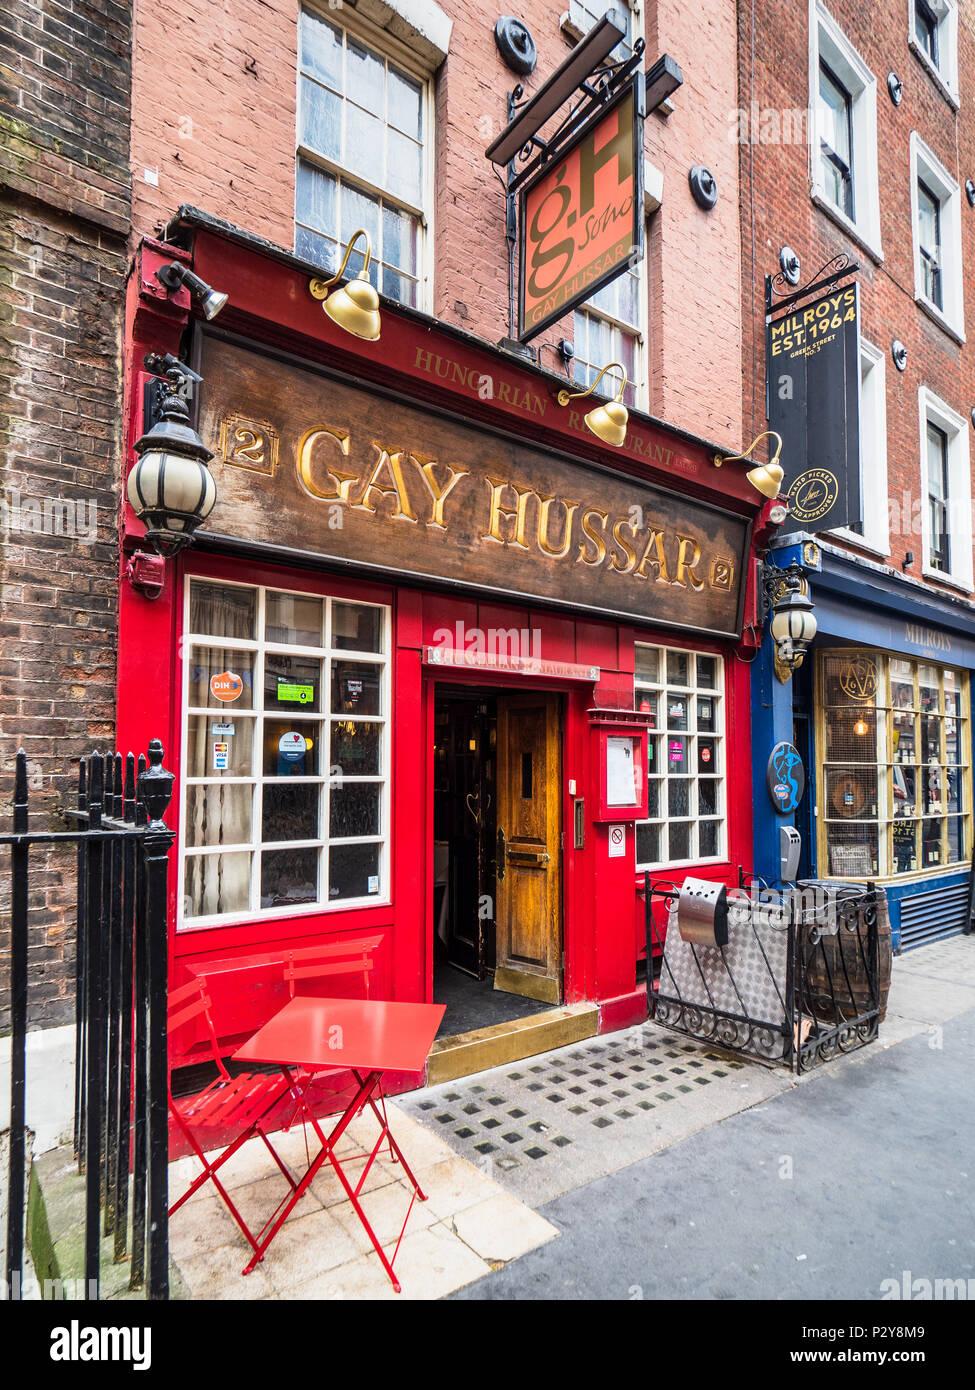 amateur file gay host